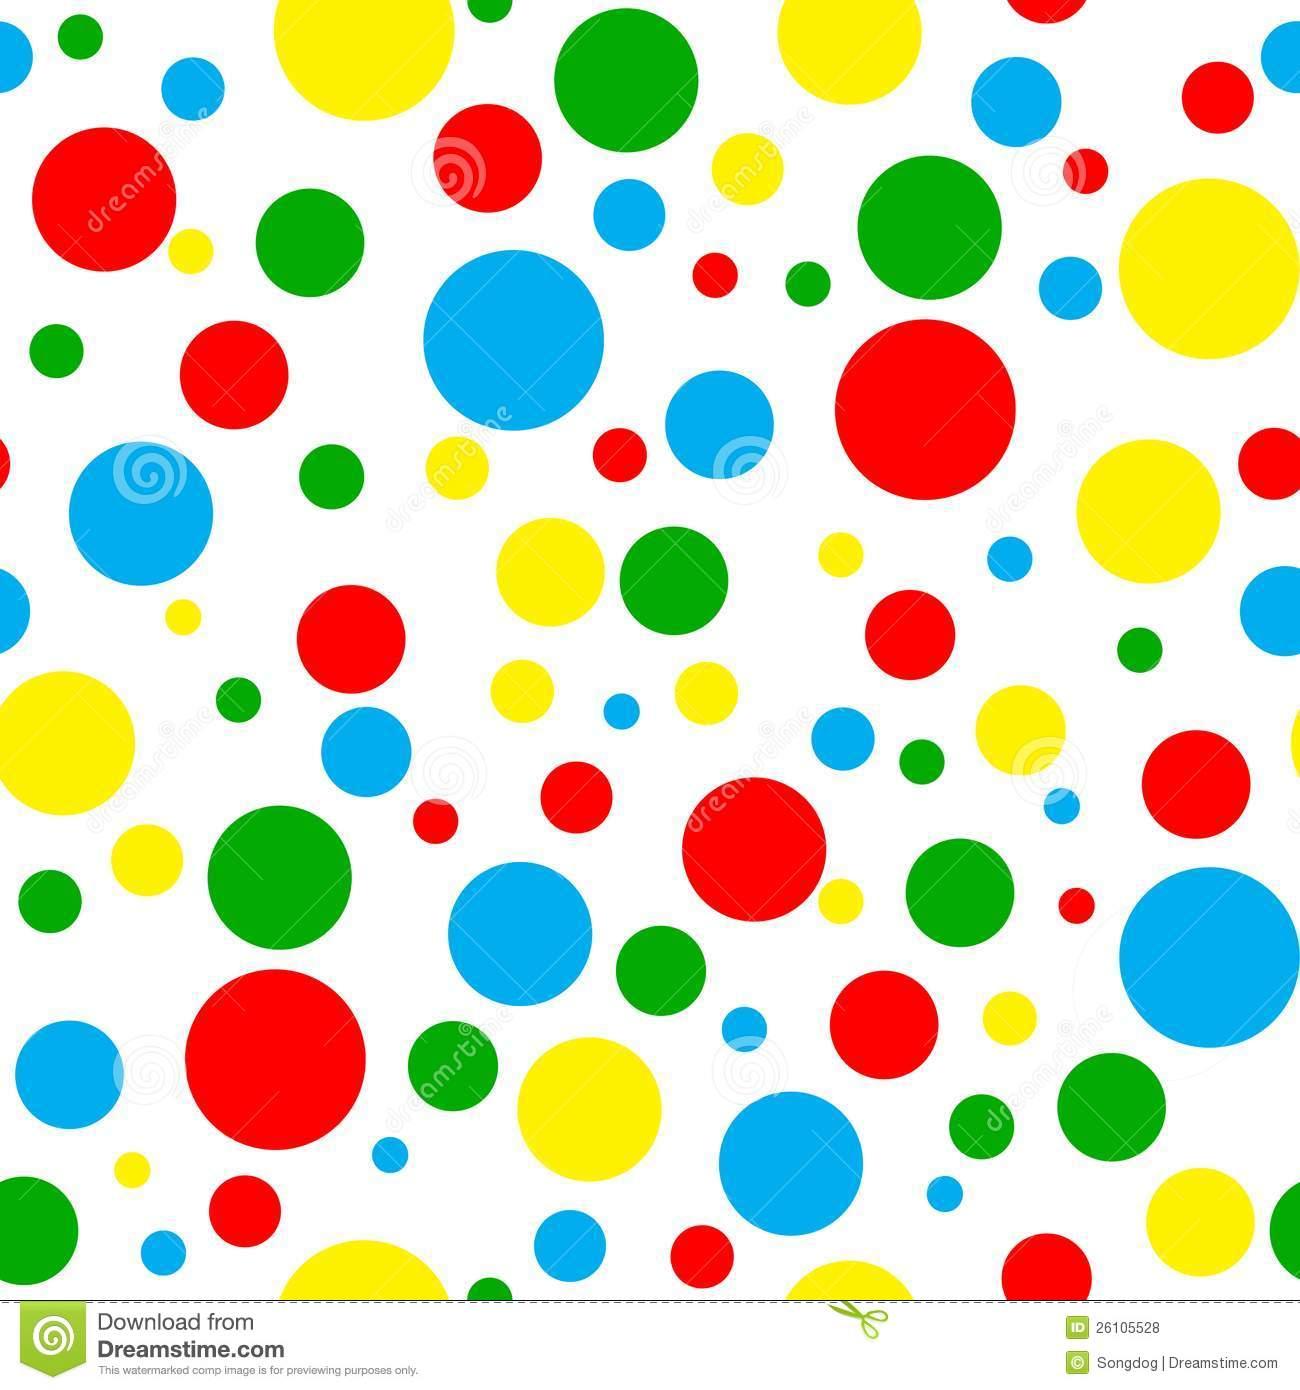 Dots clipart net Download Clipart Poka Poka Dot